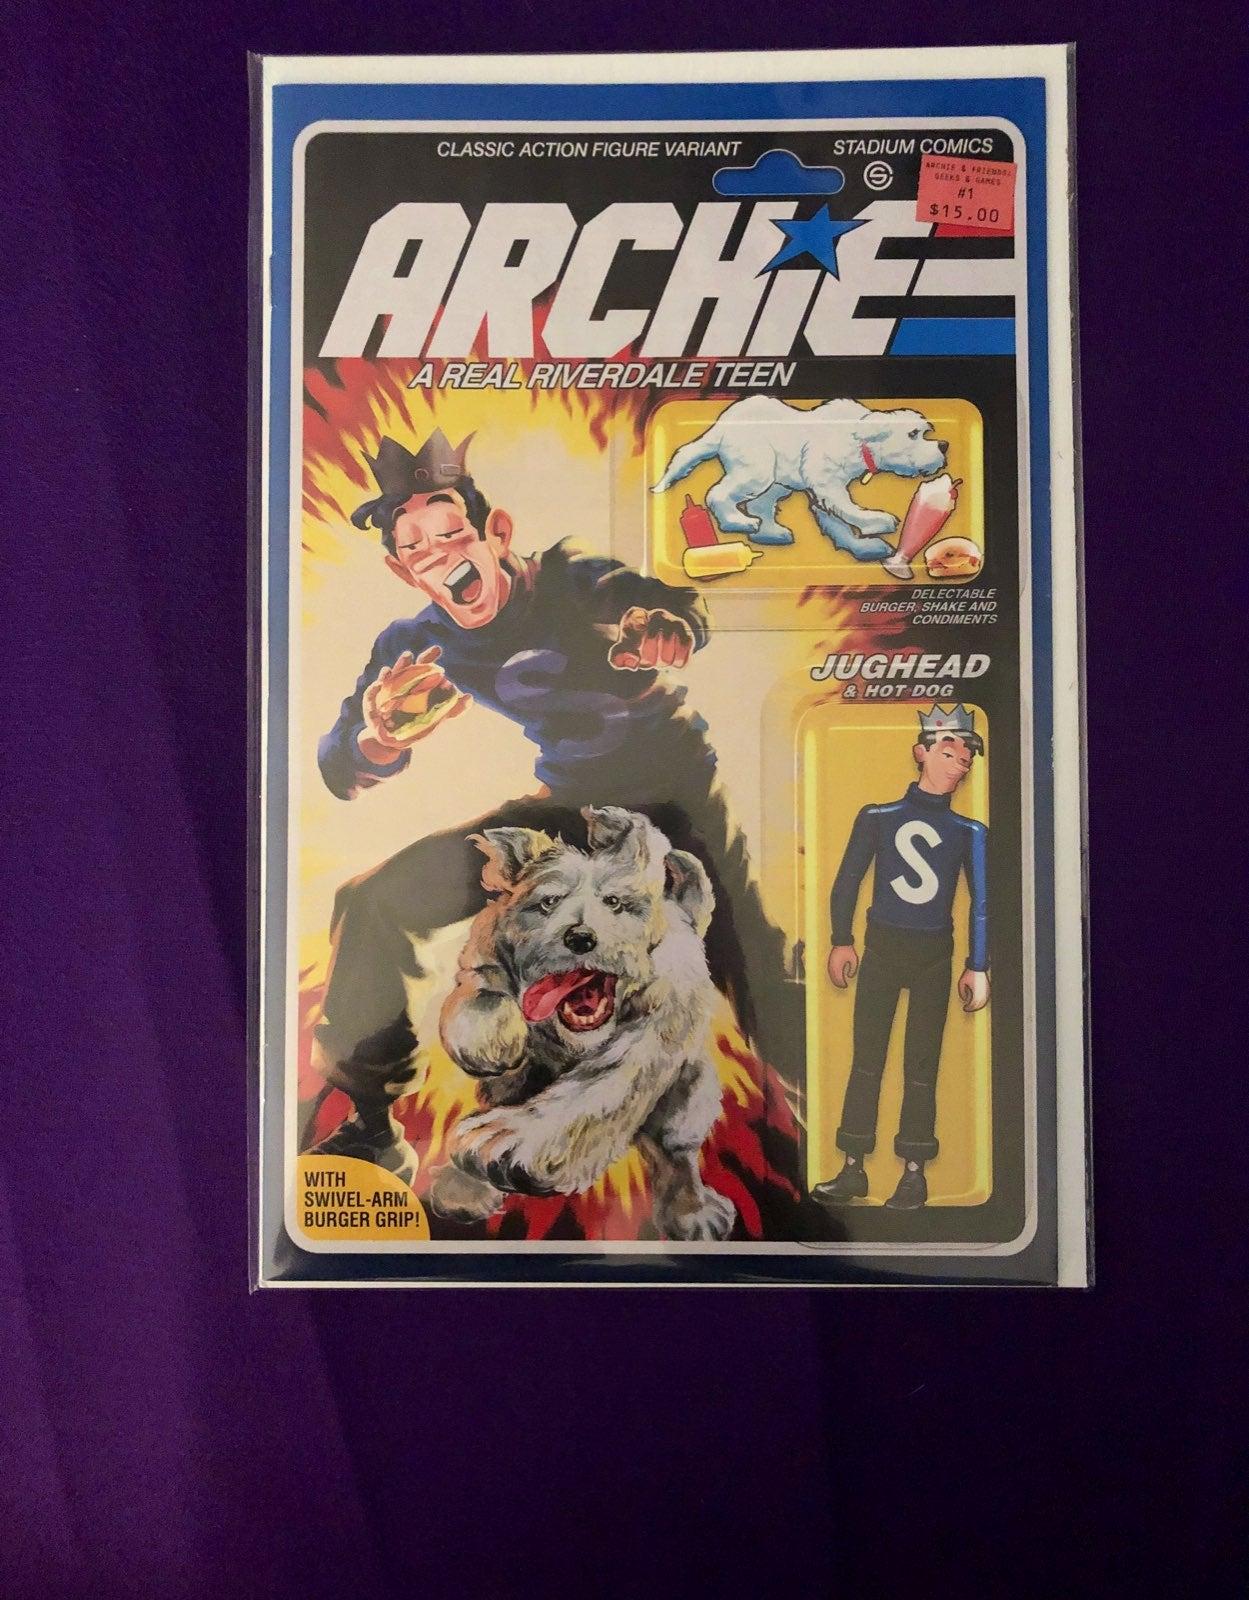 ARCHIE & FRIENDS #1 GI JOE Figure Homage